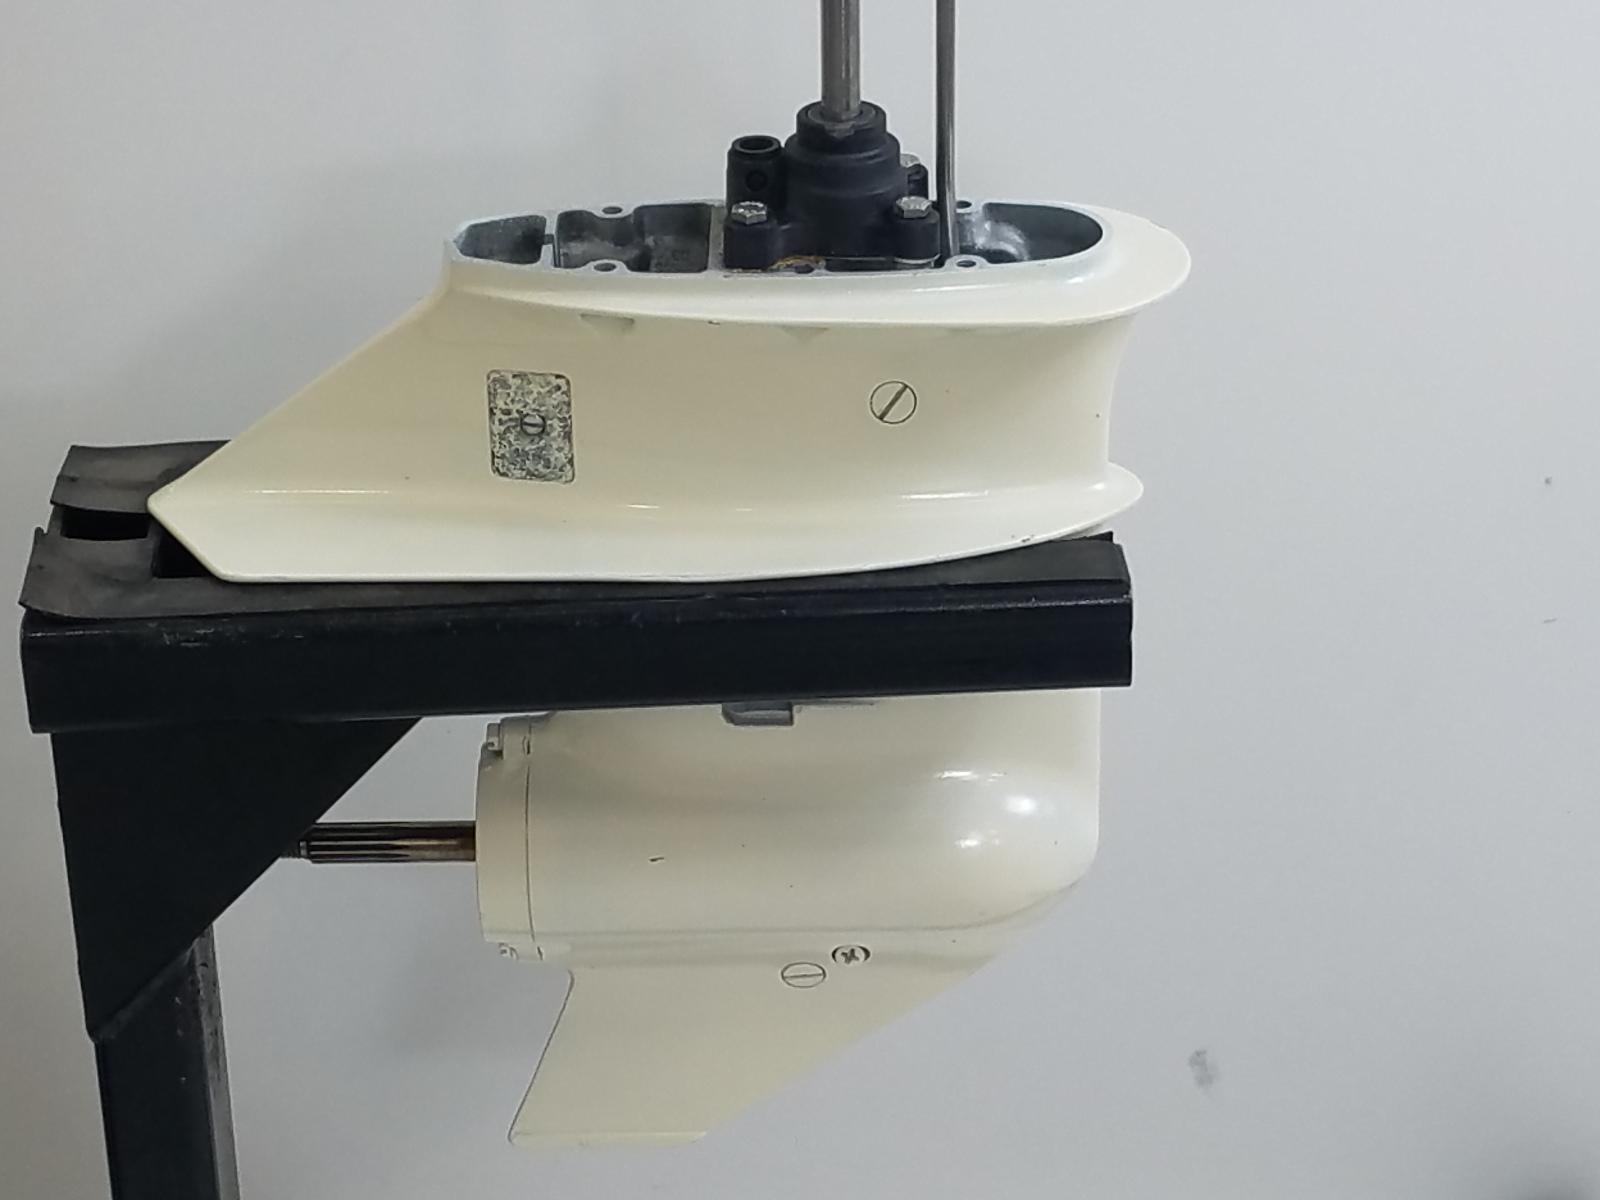 Evinrude 15 Hp 4 Stroke outboard Motor Manual pdf